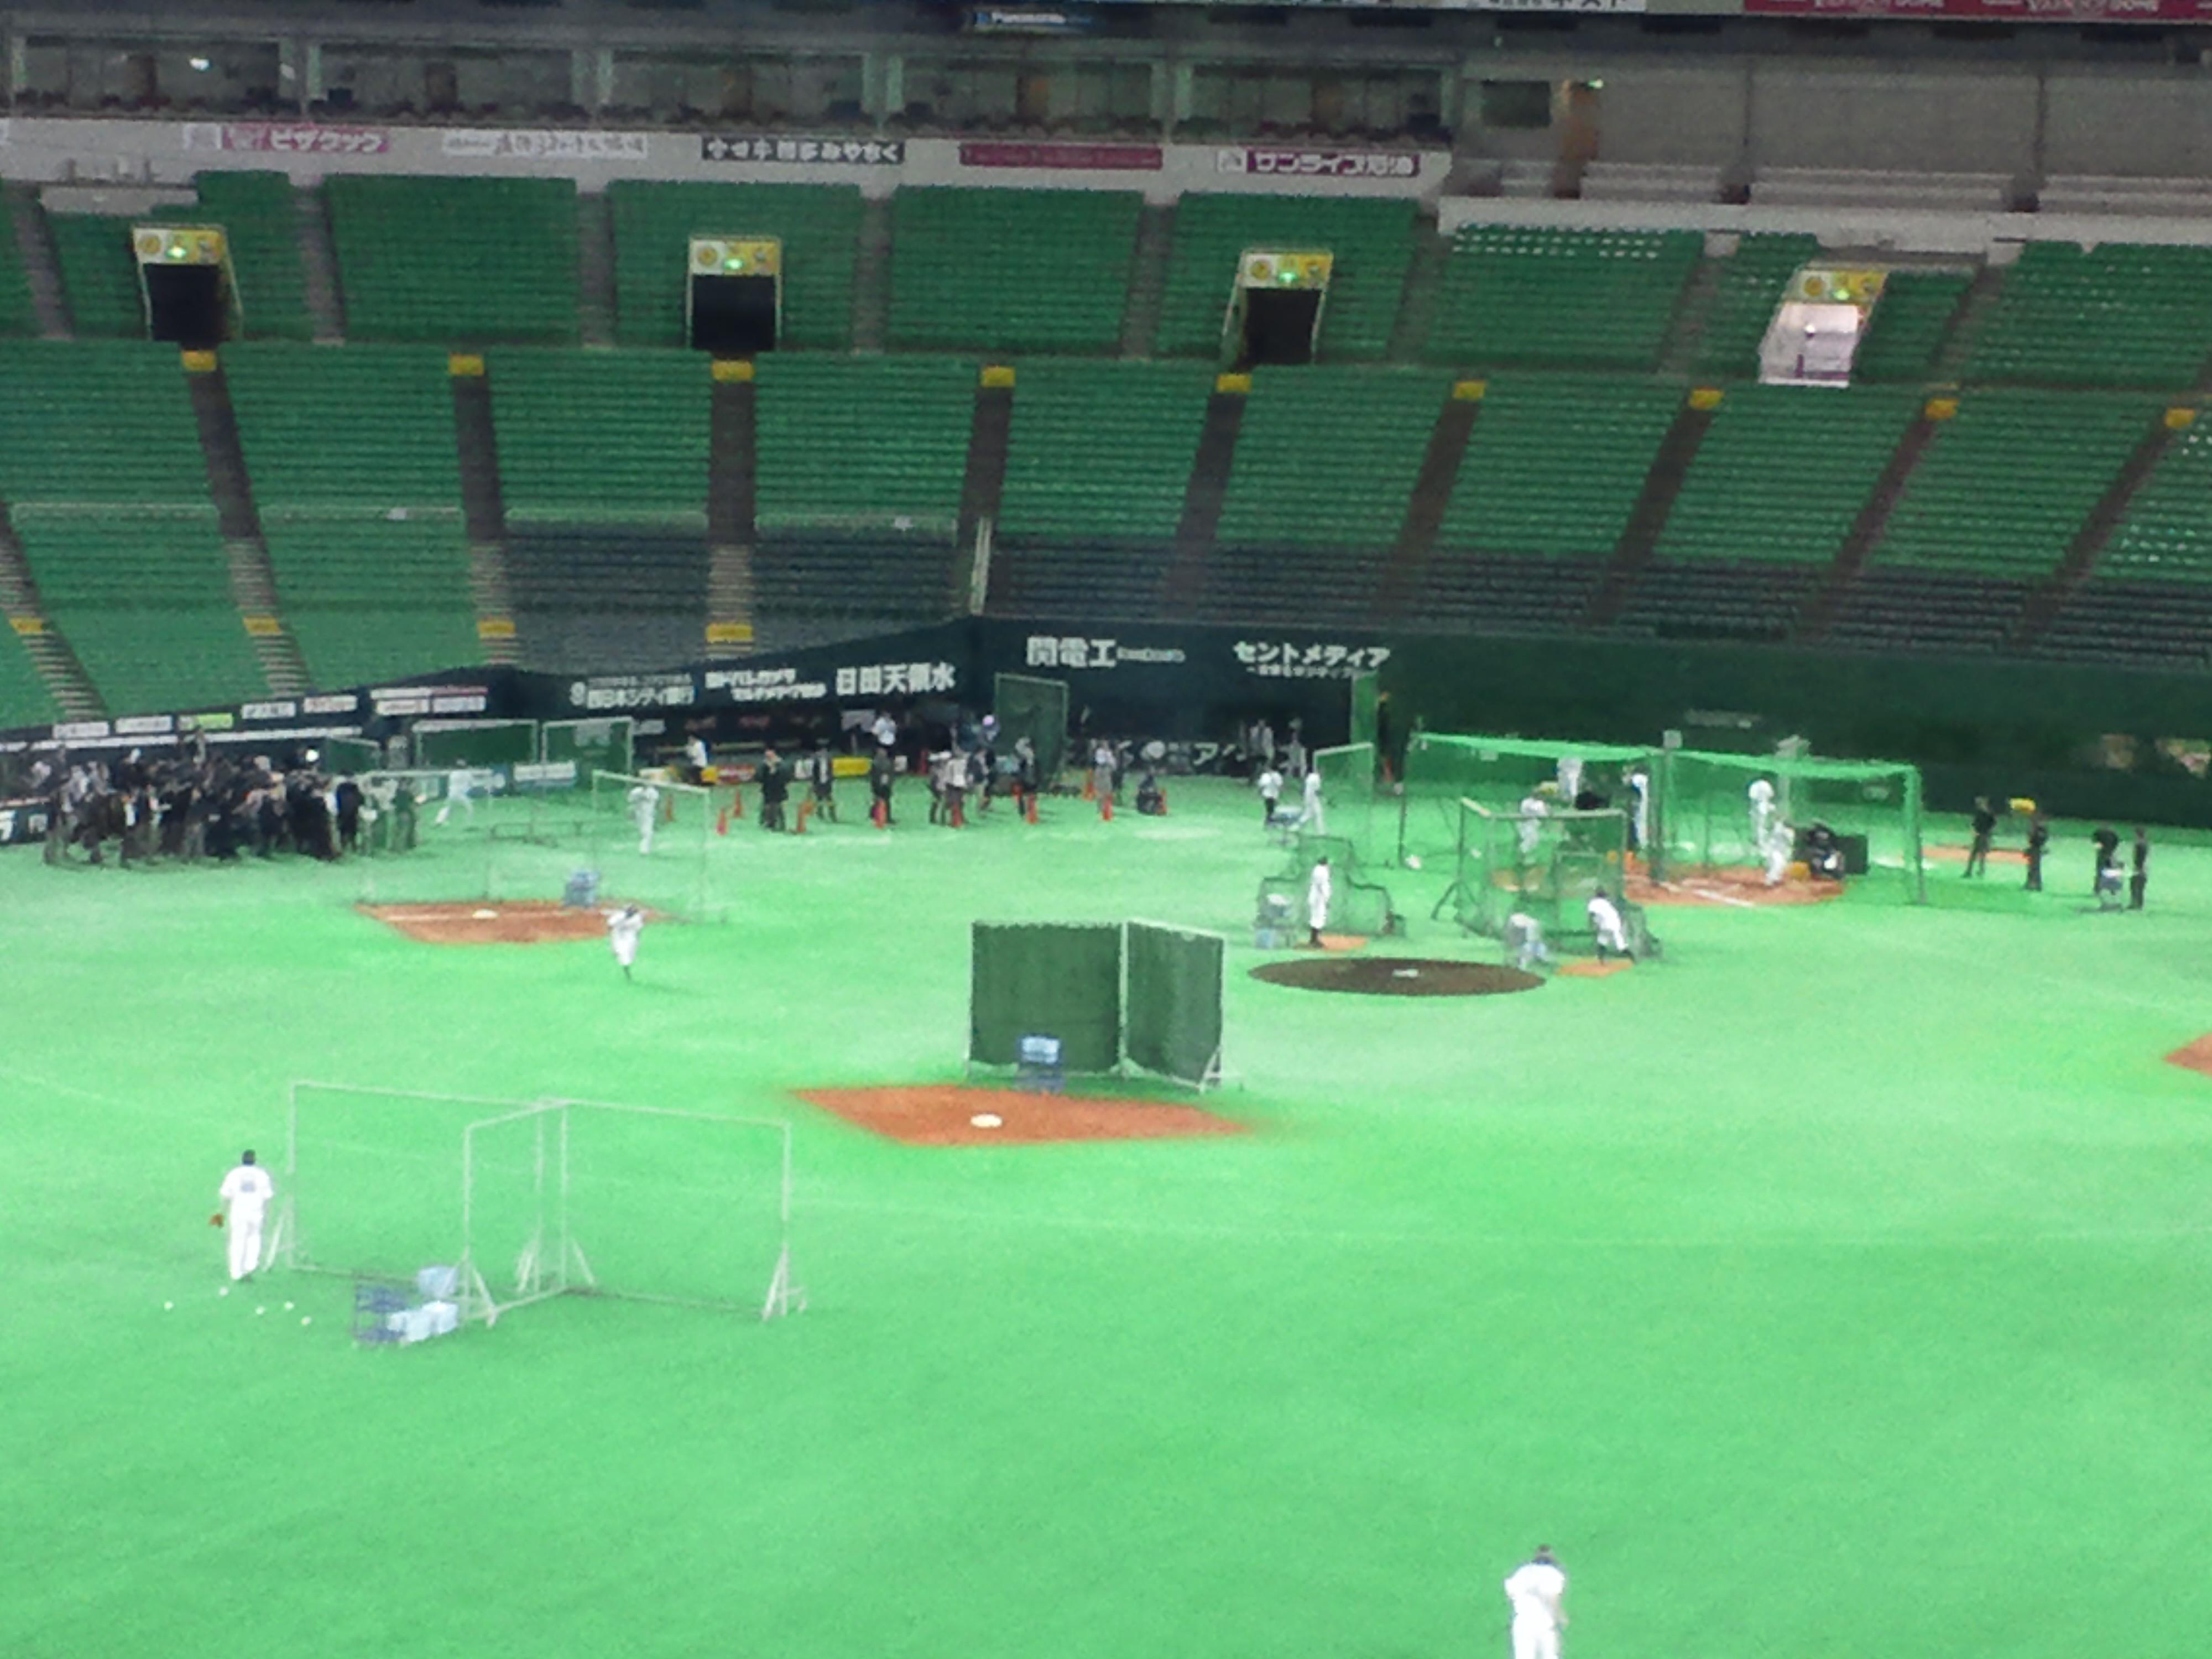 http://www.t-ueda.jp/myblog/DSC_0063.JPG